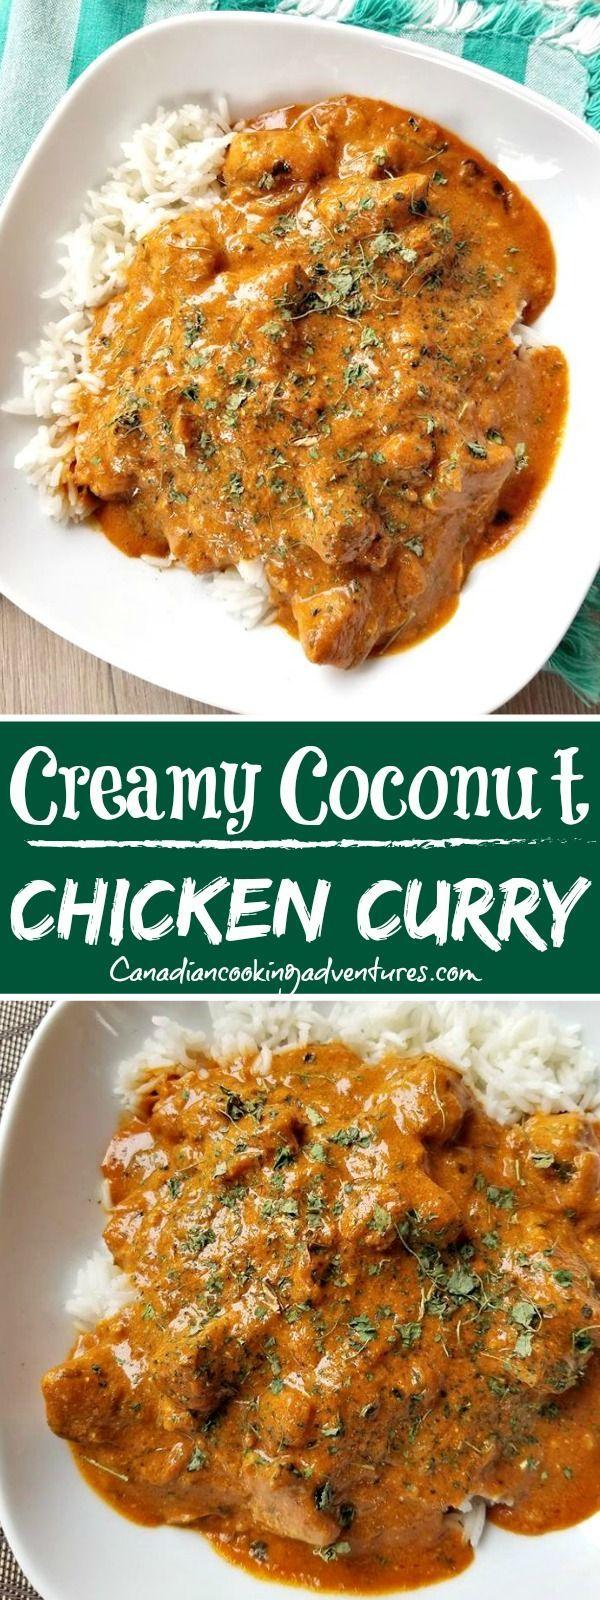 Cremiges Kokosnuss-Curry-Huhn #cremig #Kokosnuss #Curry #Huhn #Indisch #chickenrecipes